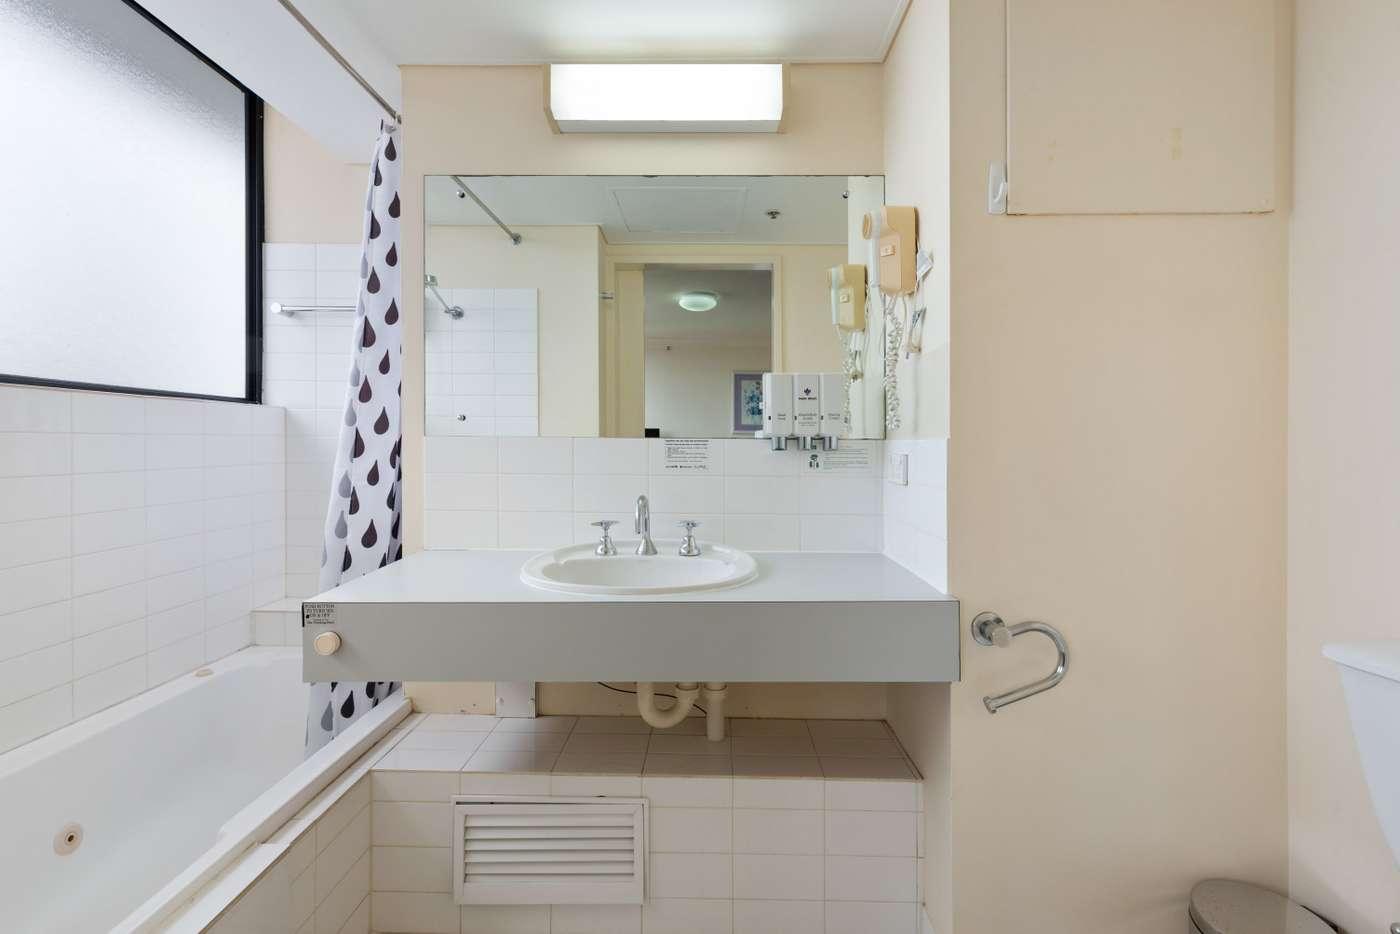 Sixth view of Homely unit listing, 137/293 North Quay, Brisbane City QLD 4000